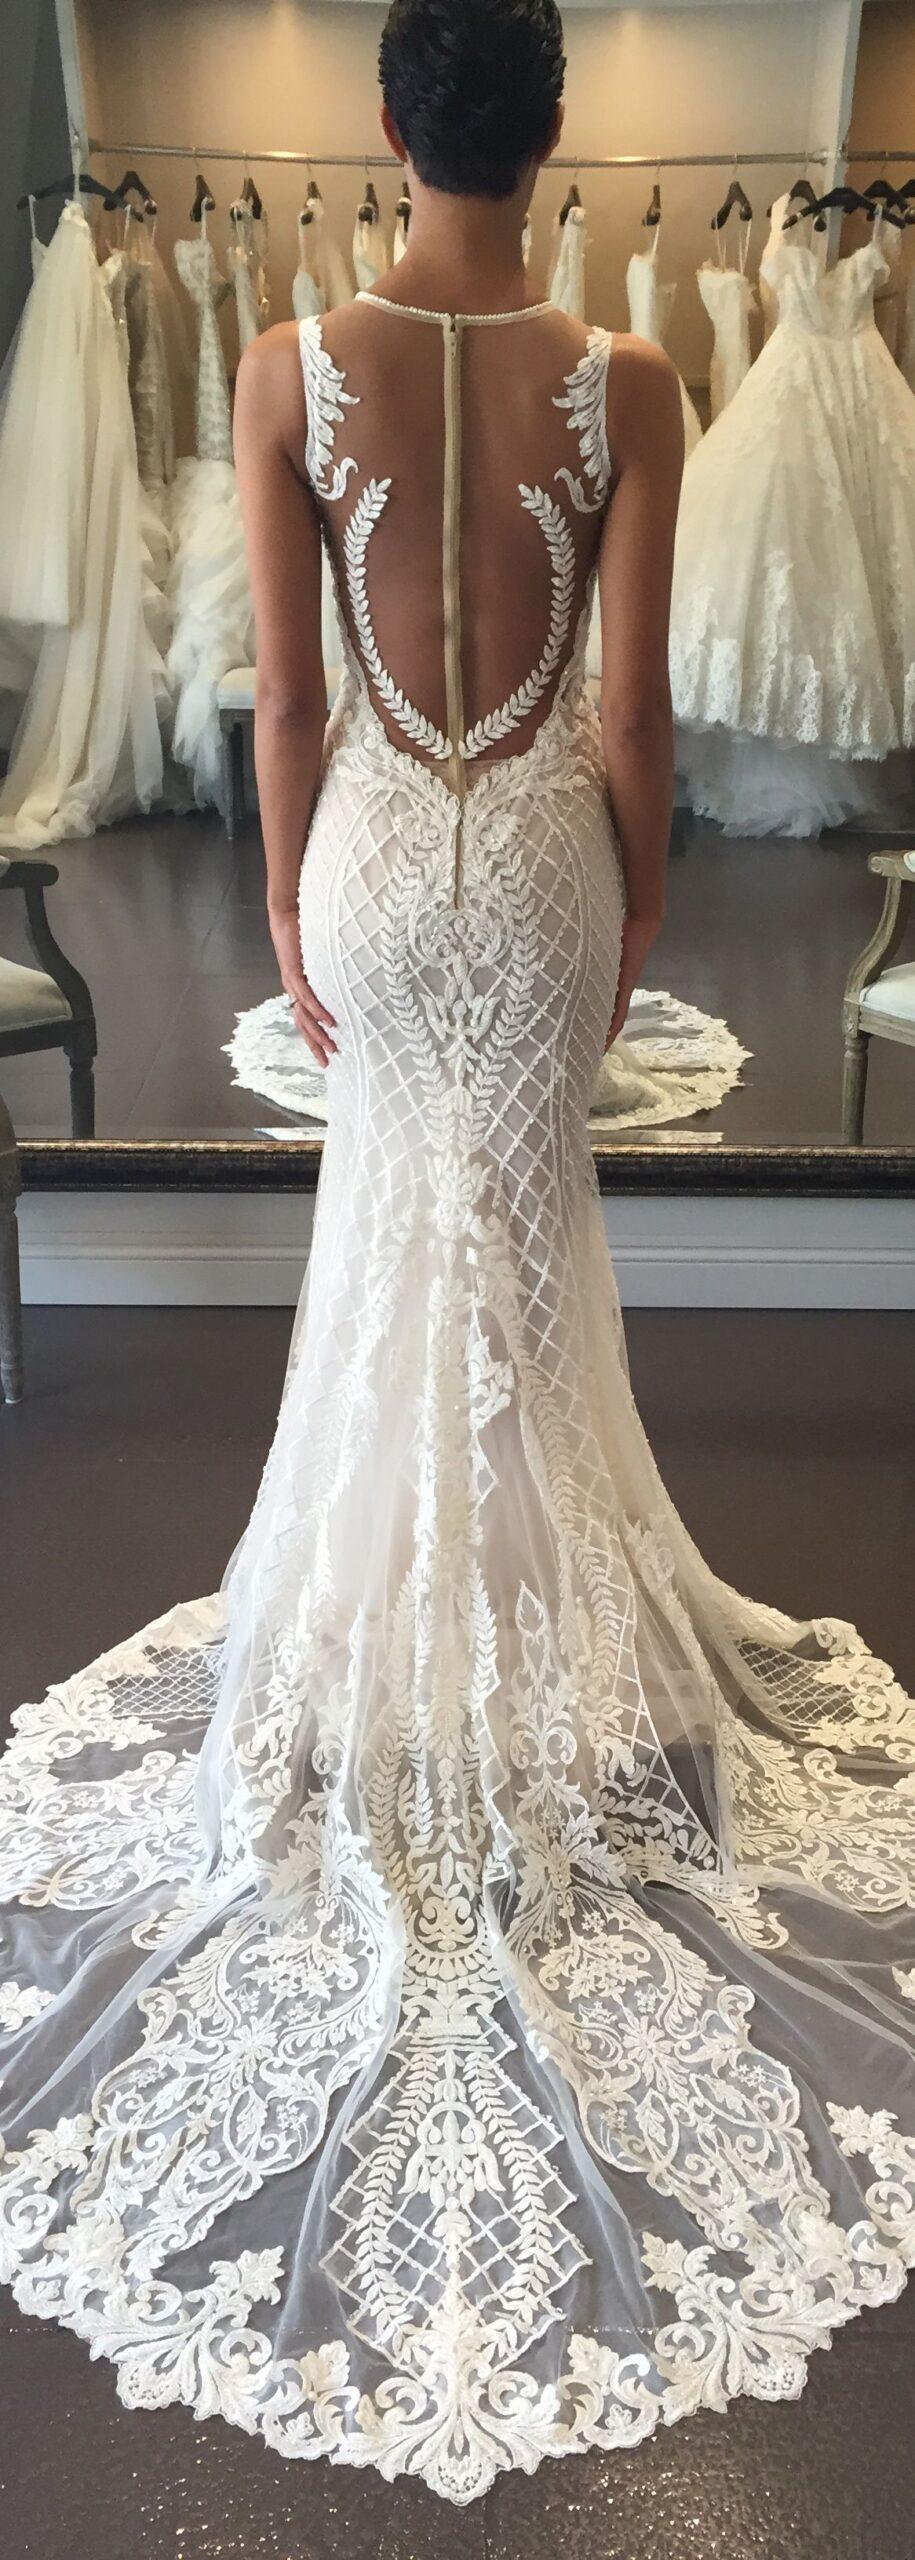 Wedding-Dresses-0927